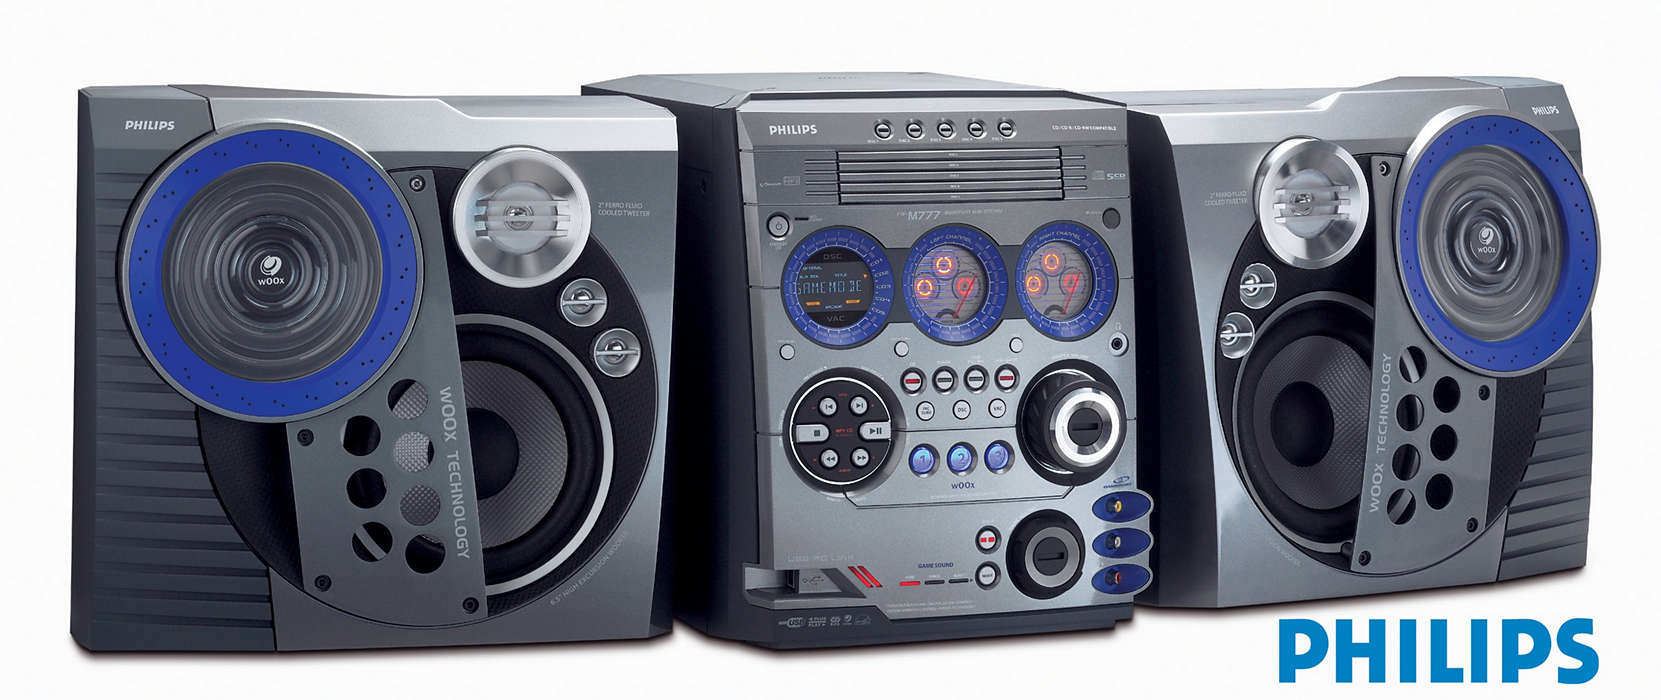 USB PC Link para transferir MP3